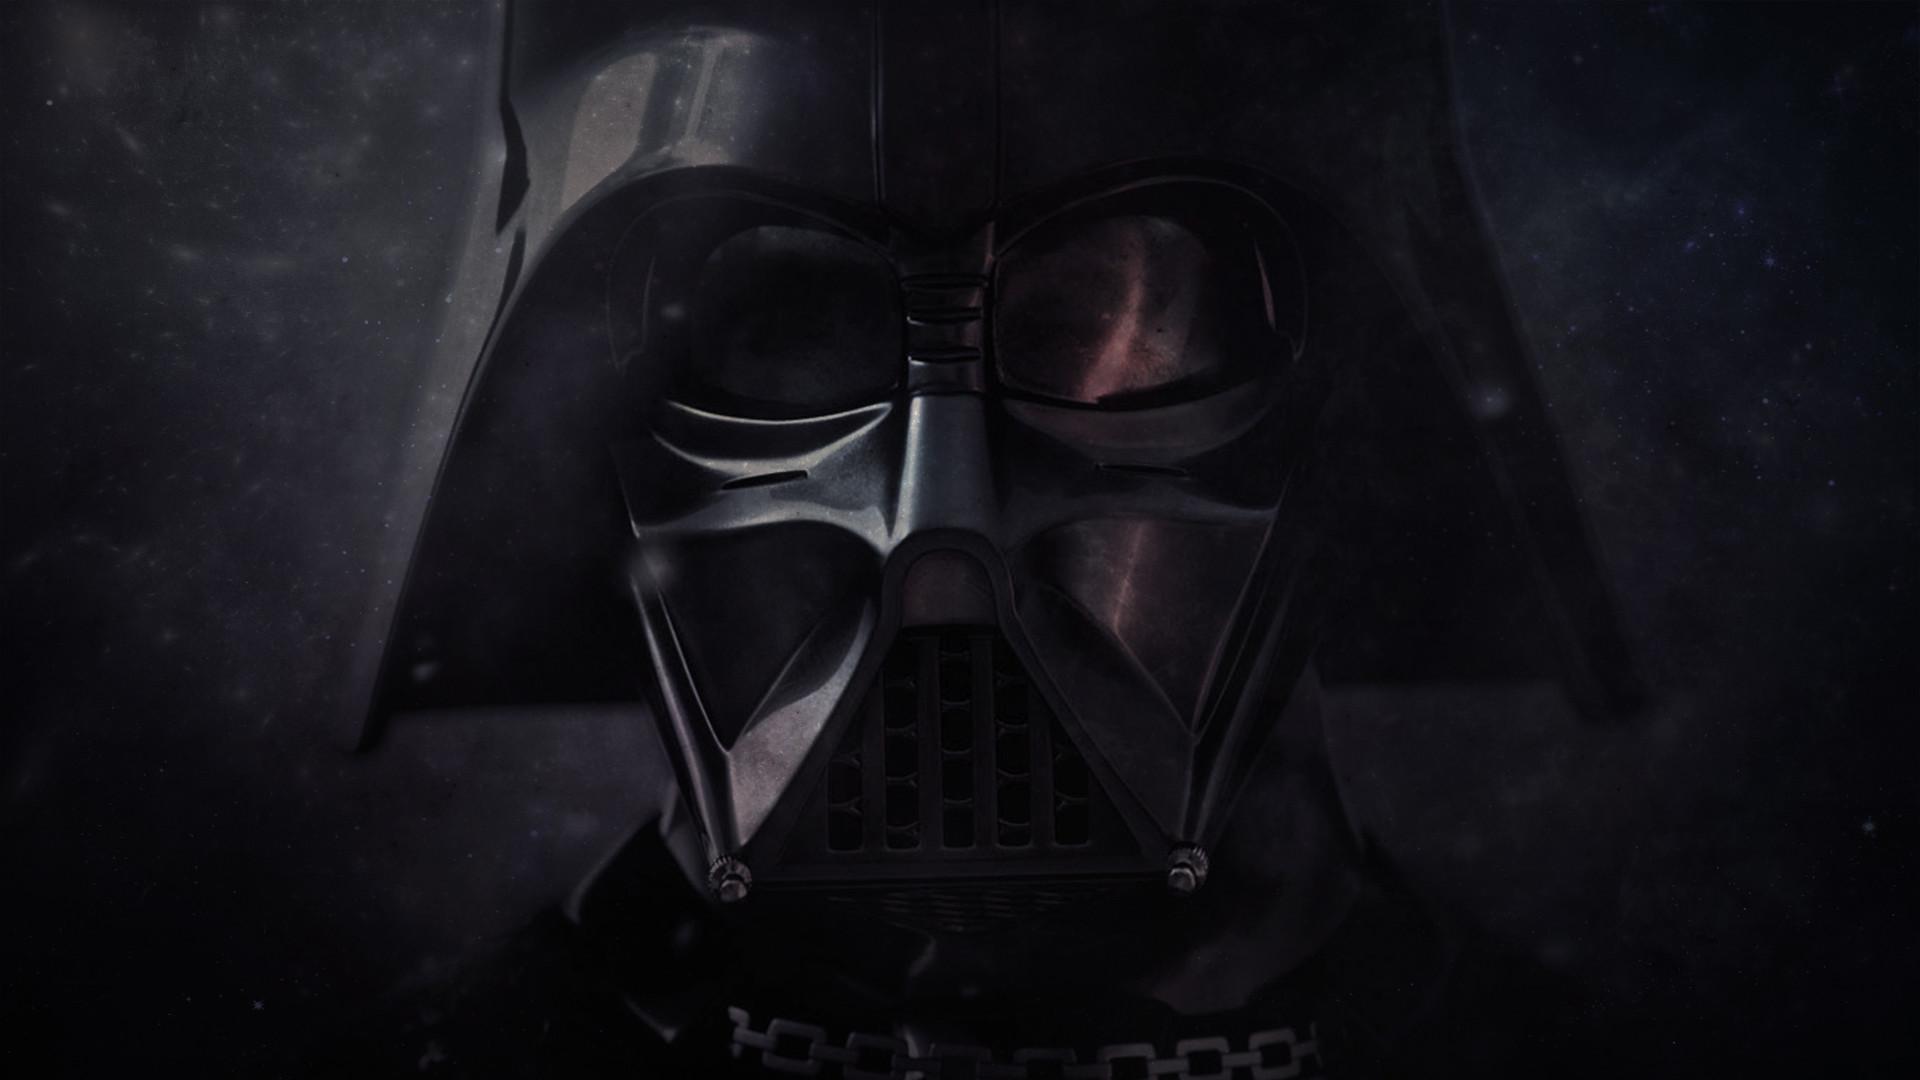 Darth Vader-Inspired PS4 System Coming This November